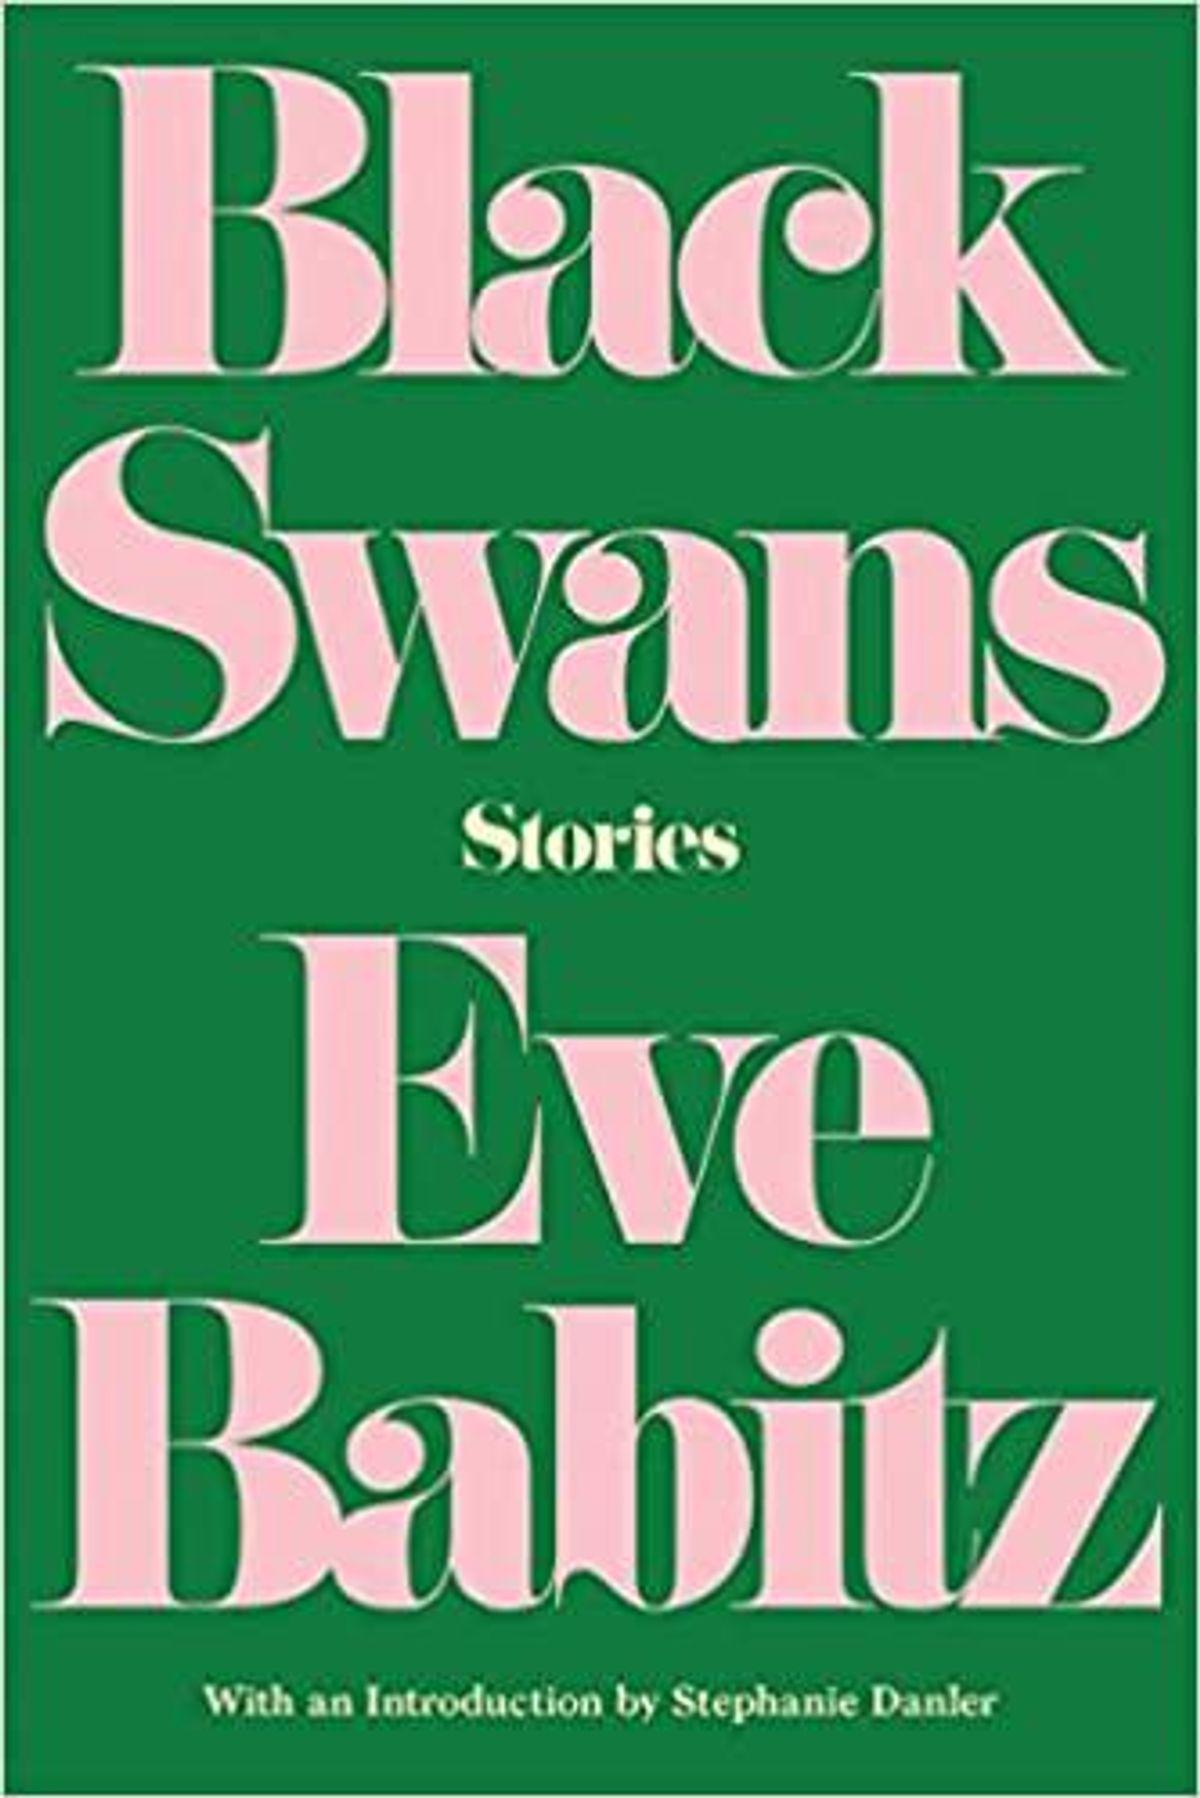 eve babitz black swans stories